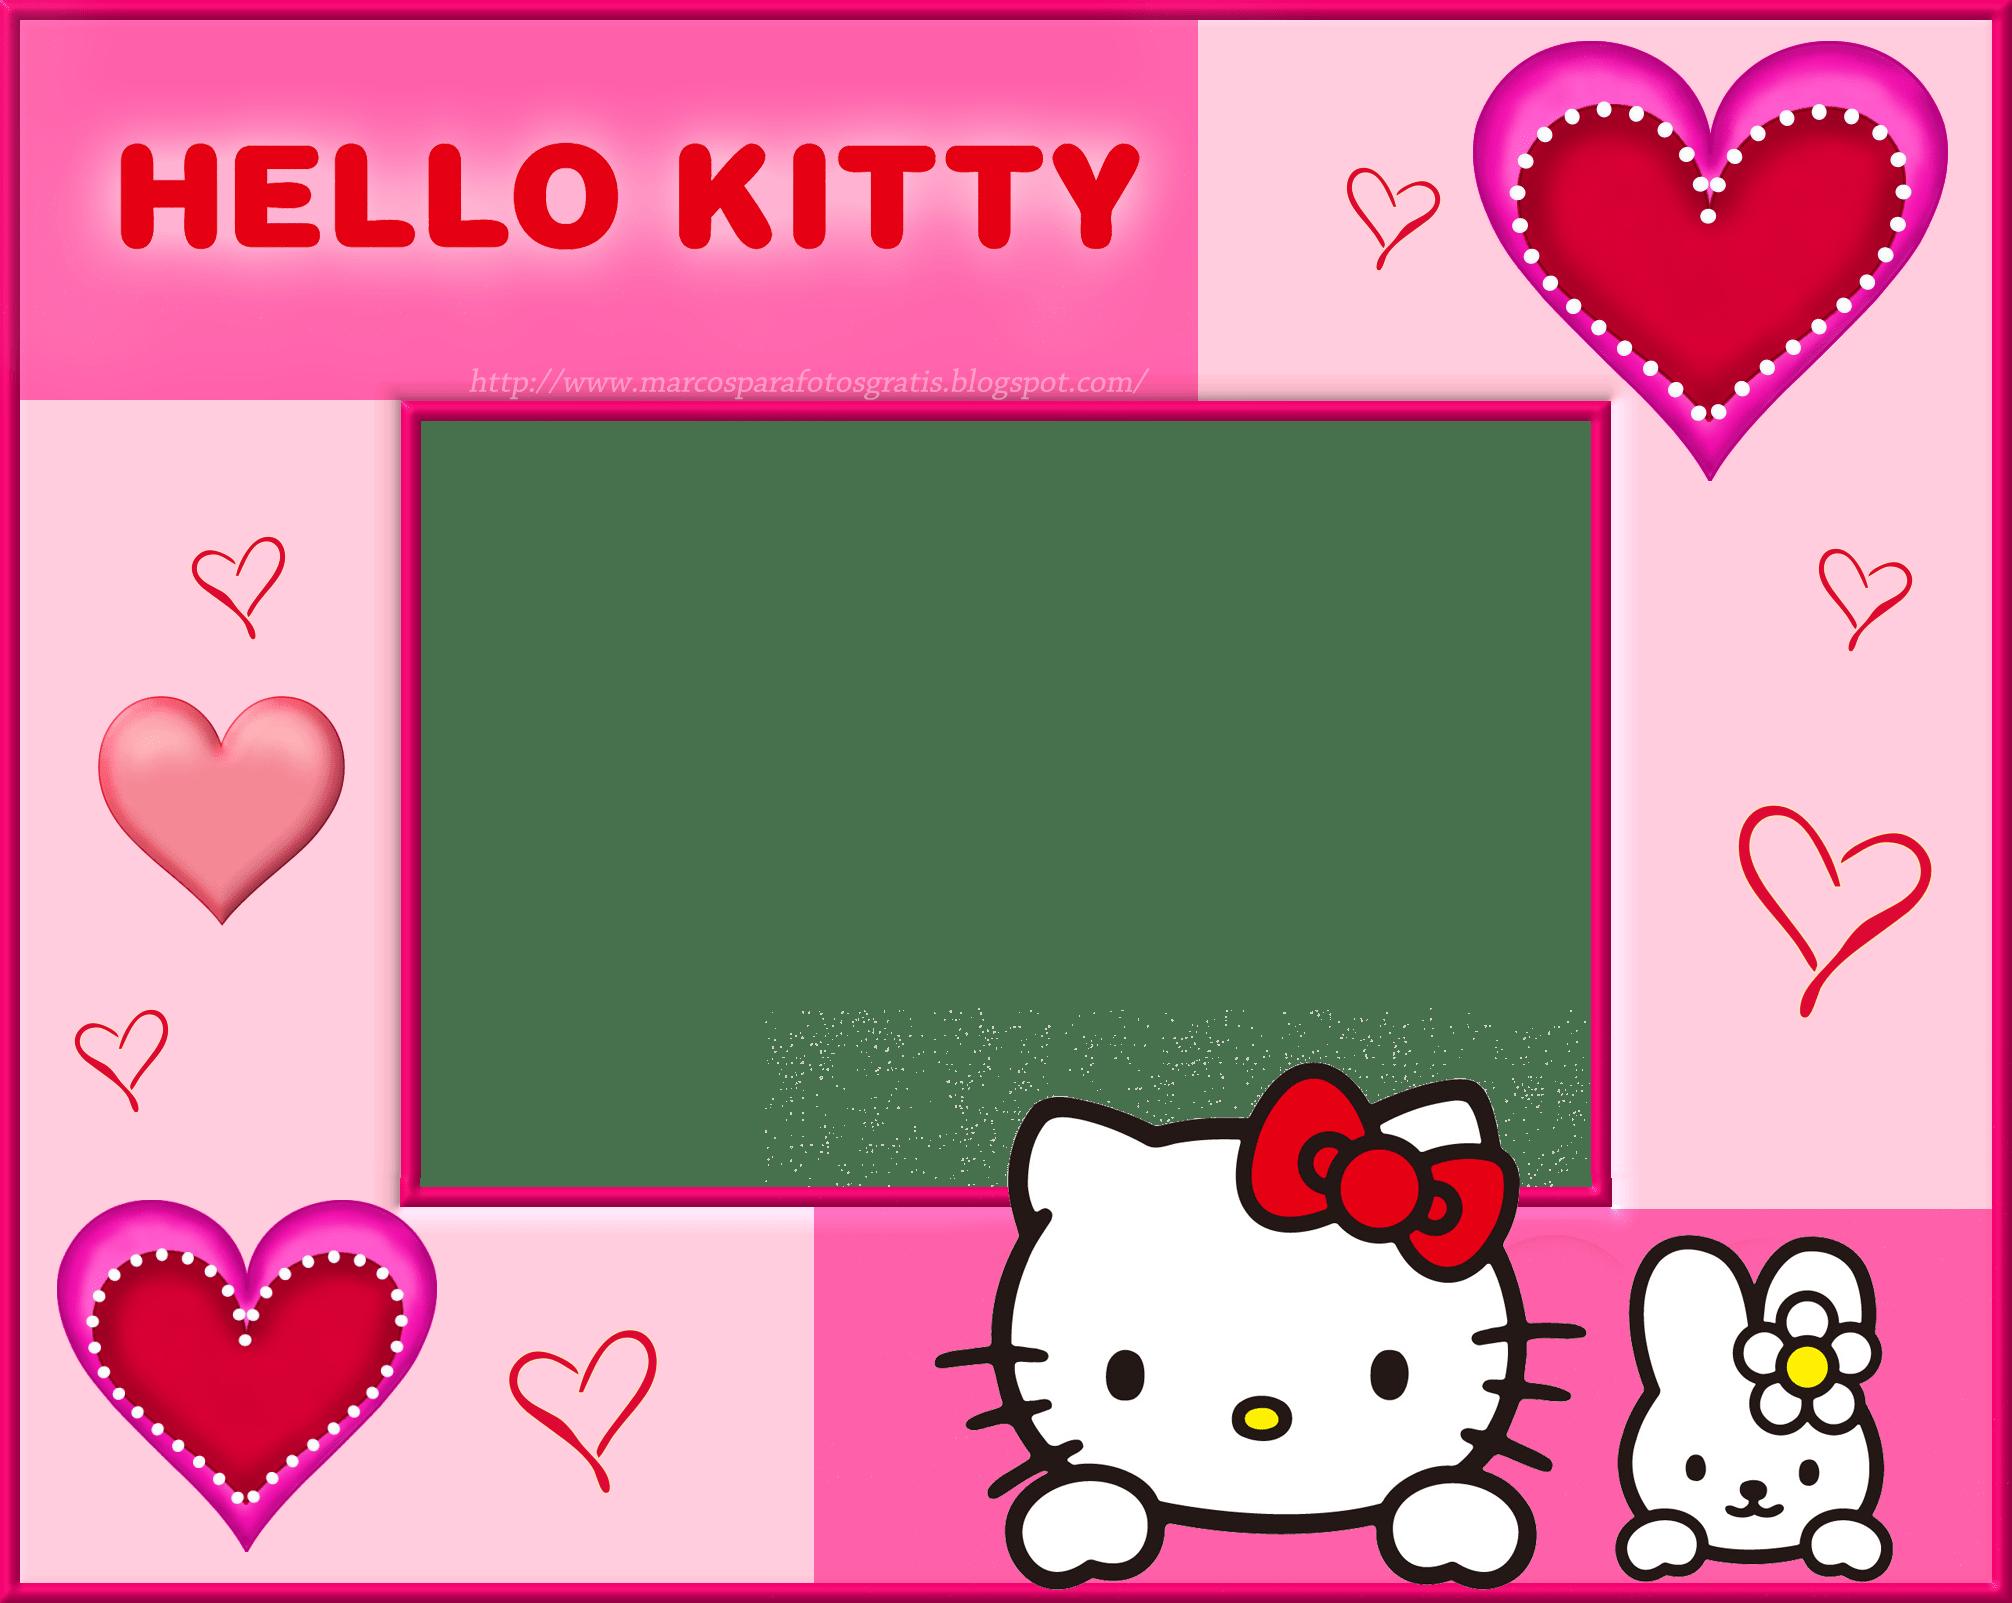 2012x1603 Free Hello Kitty Wallpaper - Hello Kitty Background